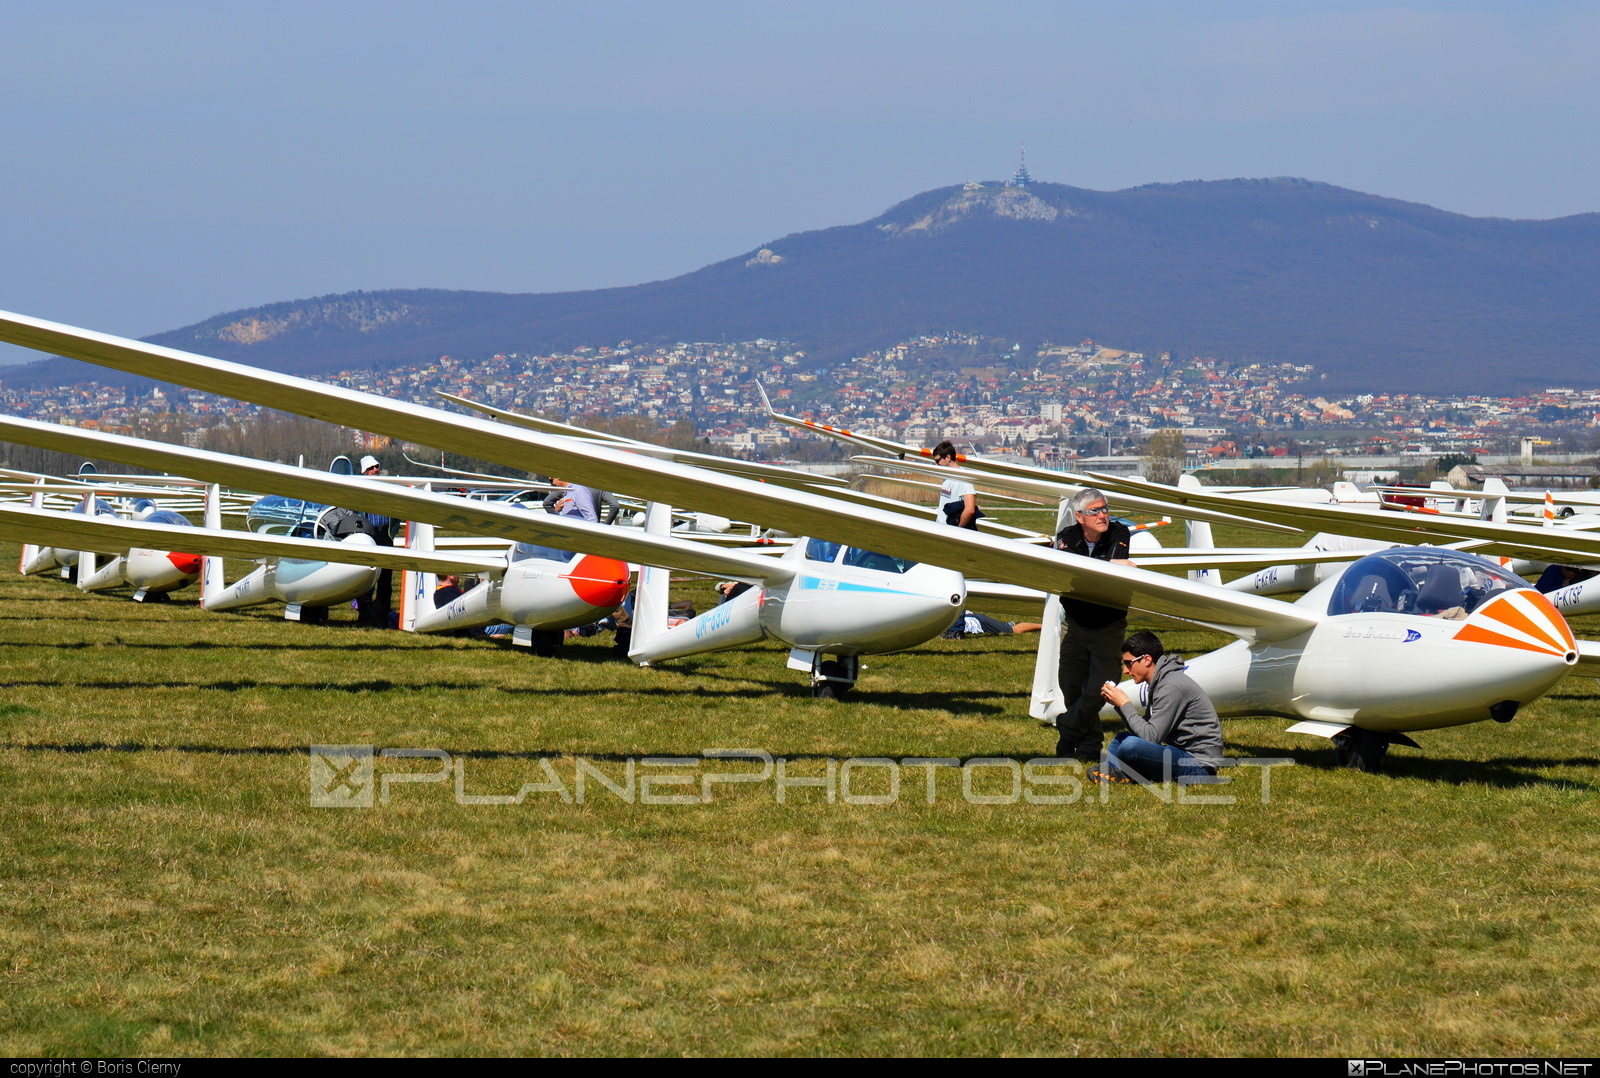 DG Flugzeugbau DG-1000T - OM-8800 operated by Slovenský národný aeroklub (Slovak National Aeroclub) #dgflugzeugbau